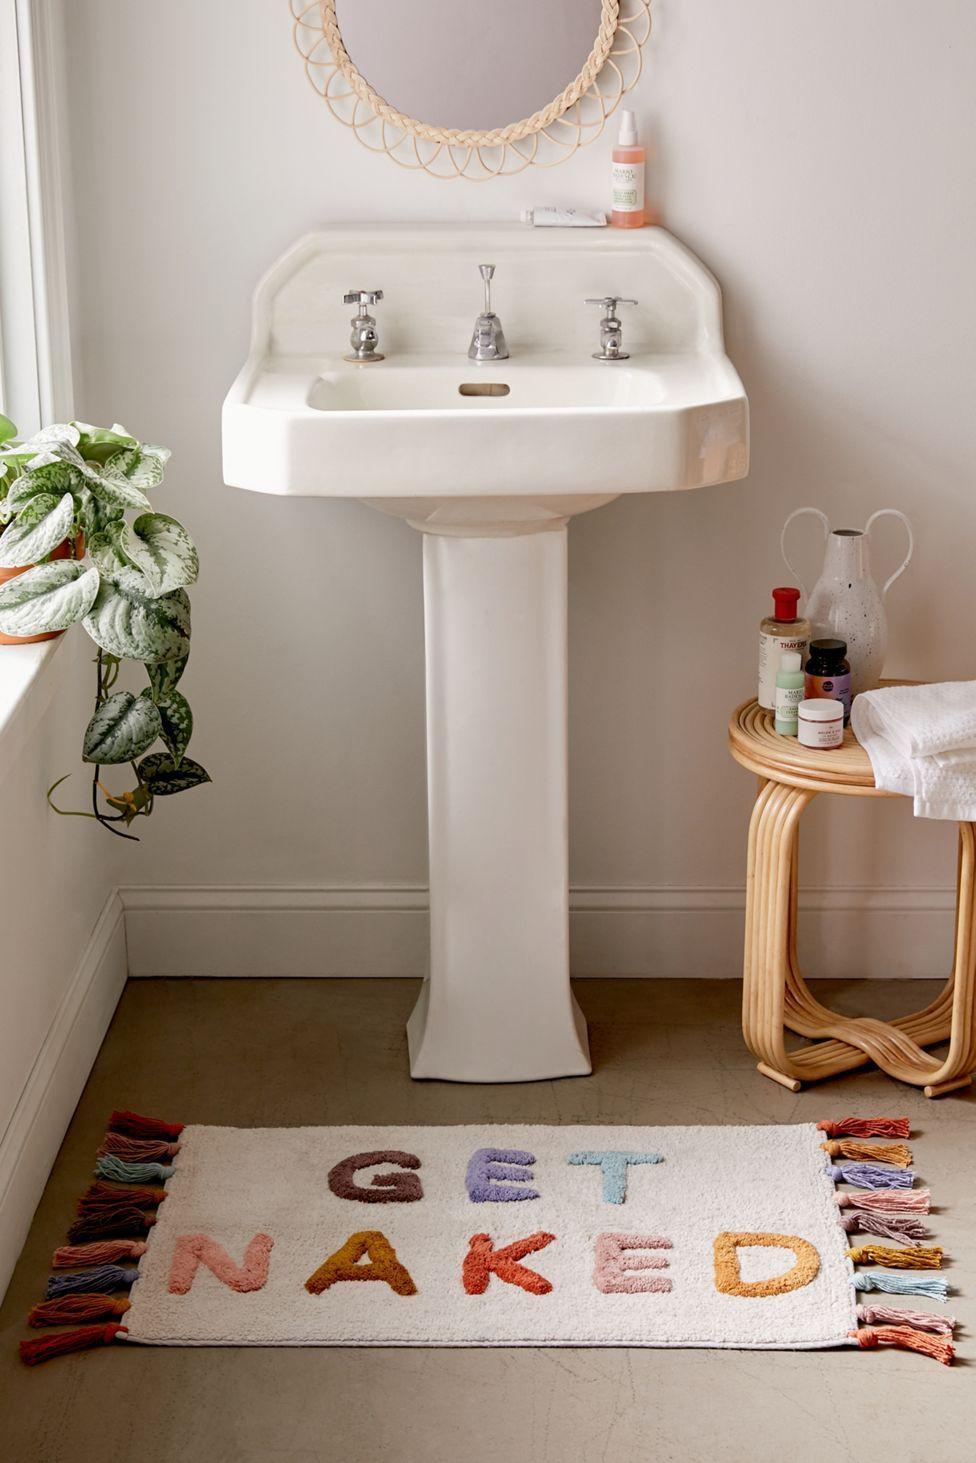 Https S7d5 Scene7 Com Is Image Urbanoutfitters 53986014 095 B Xlarge Fit Constrainq Bathroom Decor Apartment College Bathroom Decor College Apartment Decor [ 1463 x 976 Pixel ]